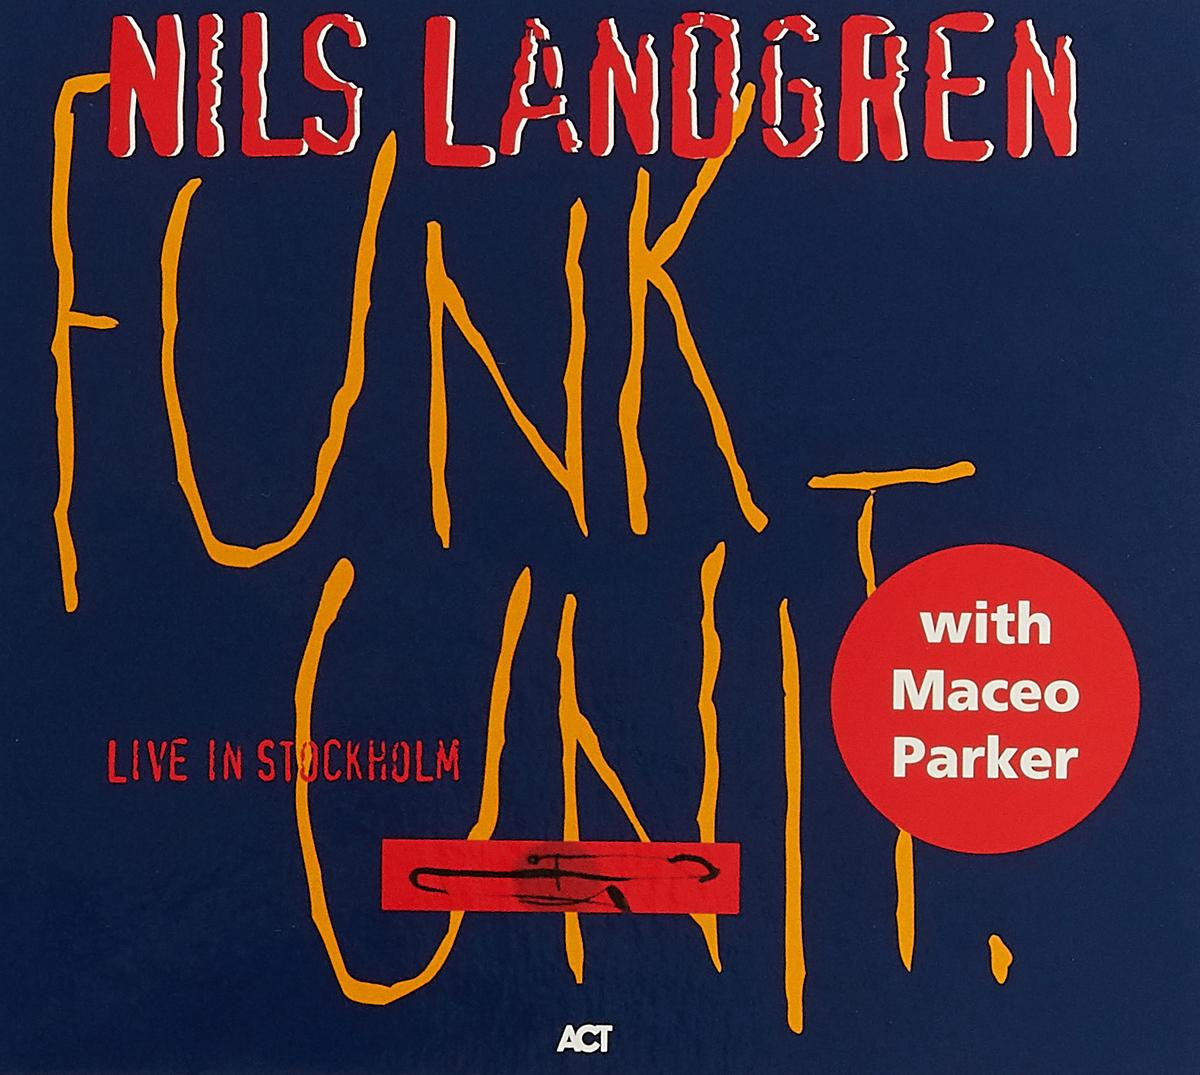 Нилс Ландгрен Nils Landgren. Funk Unit бетти нилс roheliste silmadega tüdruk